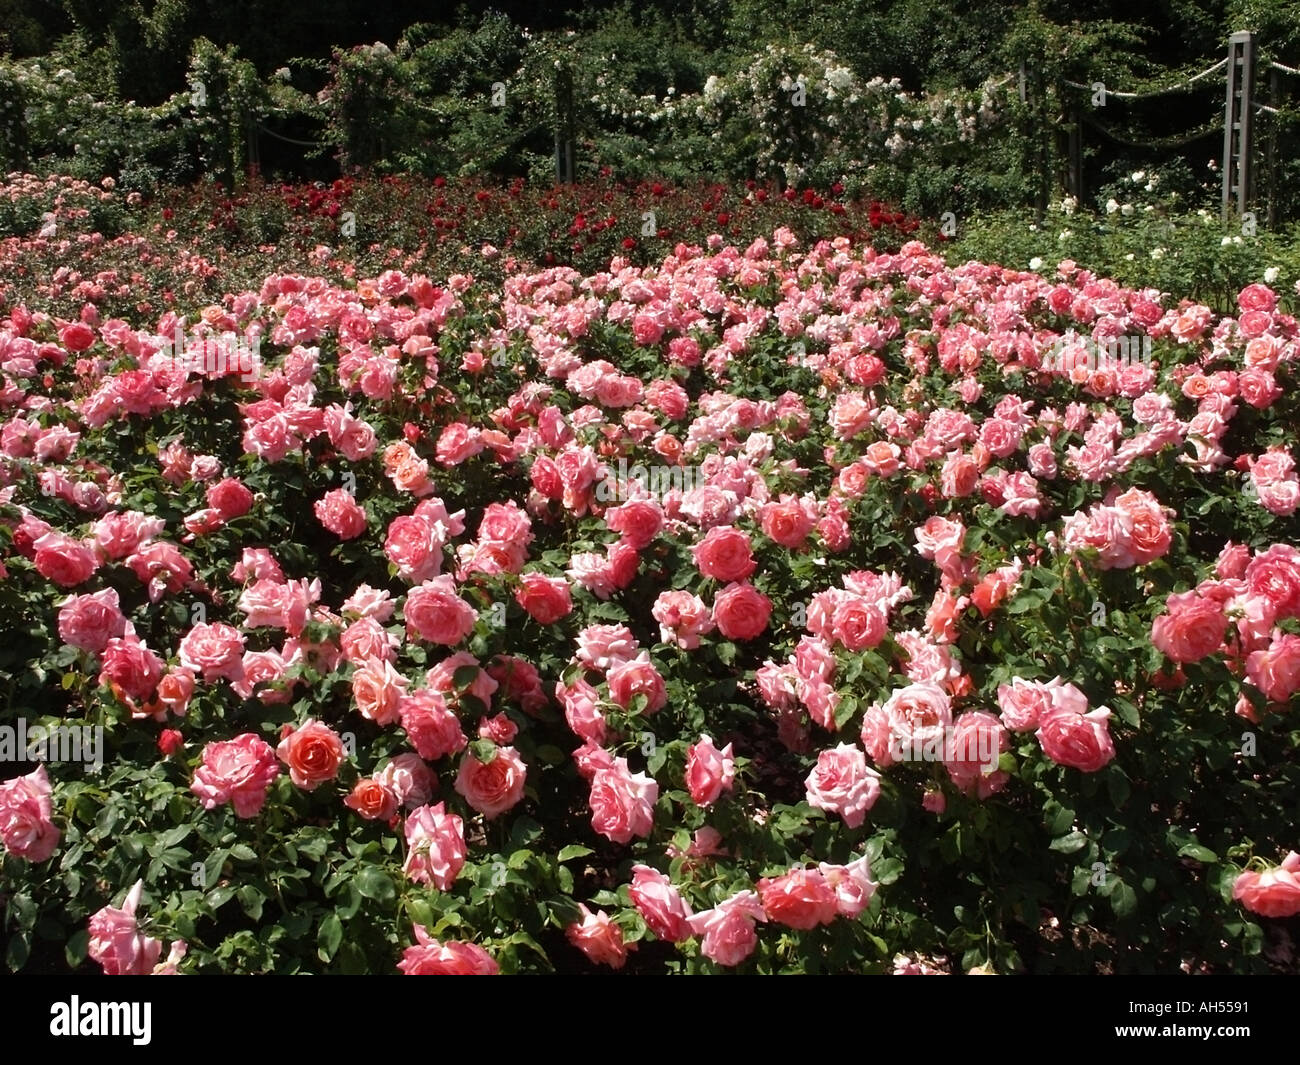 Regents park london giardini di rose in piena estate fiore una